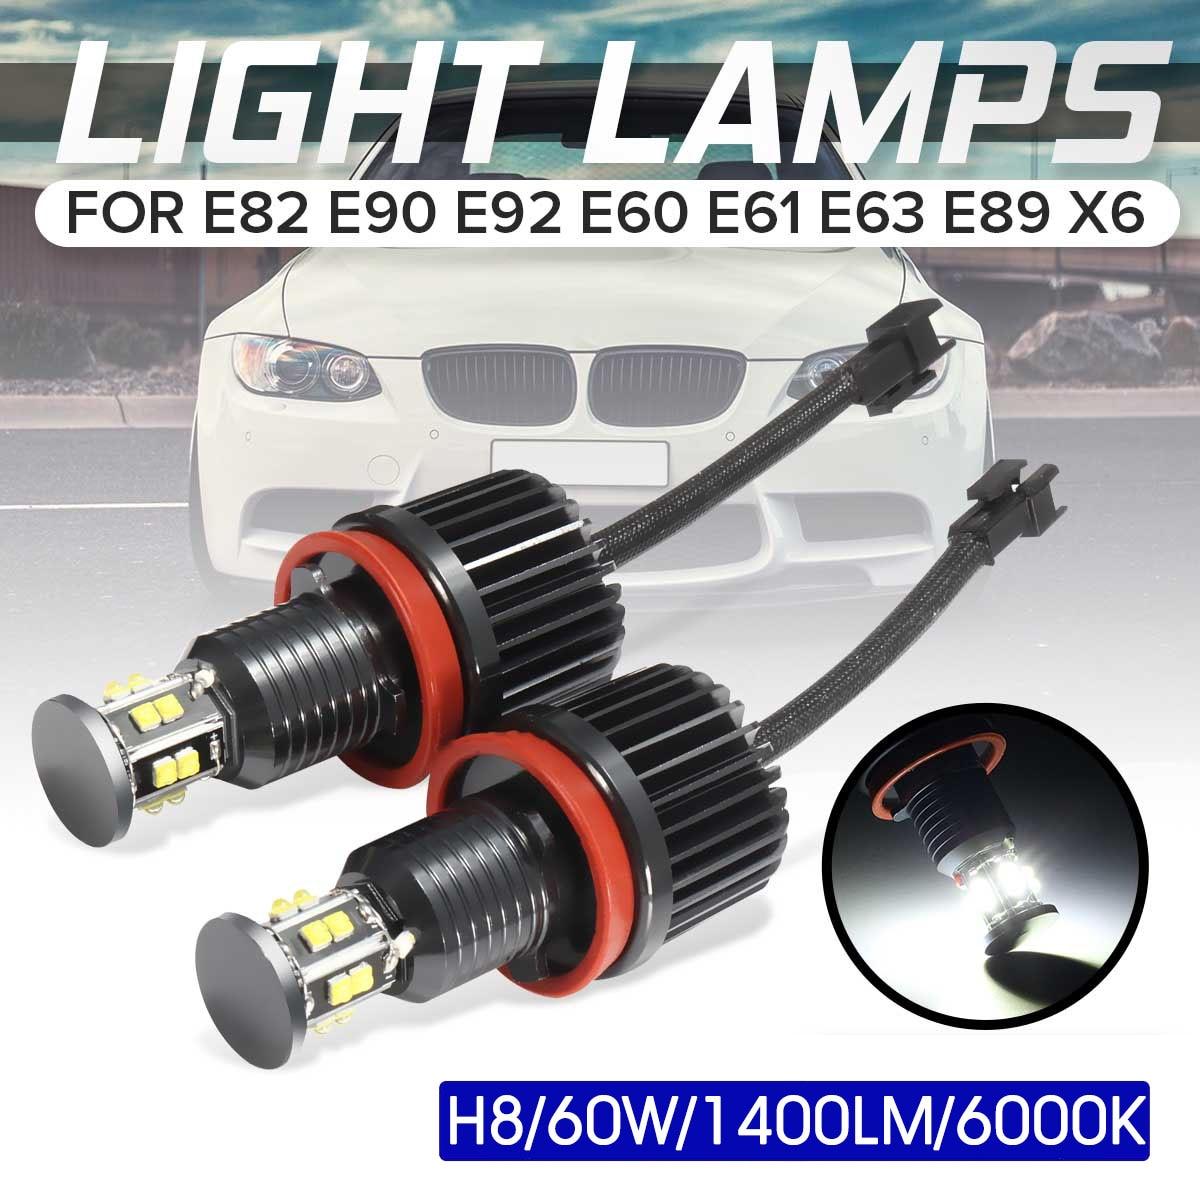 2Pcs 120W H8 LED Angel Eye Halo Ring Light Bulb Xenon White 6000K Headlight For BMW E82 E90 E92 E60 E61 E63 E89 X6